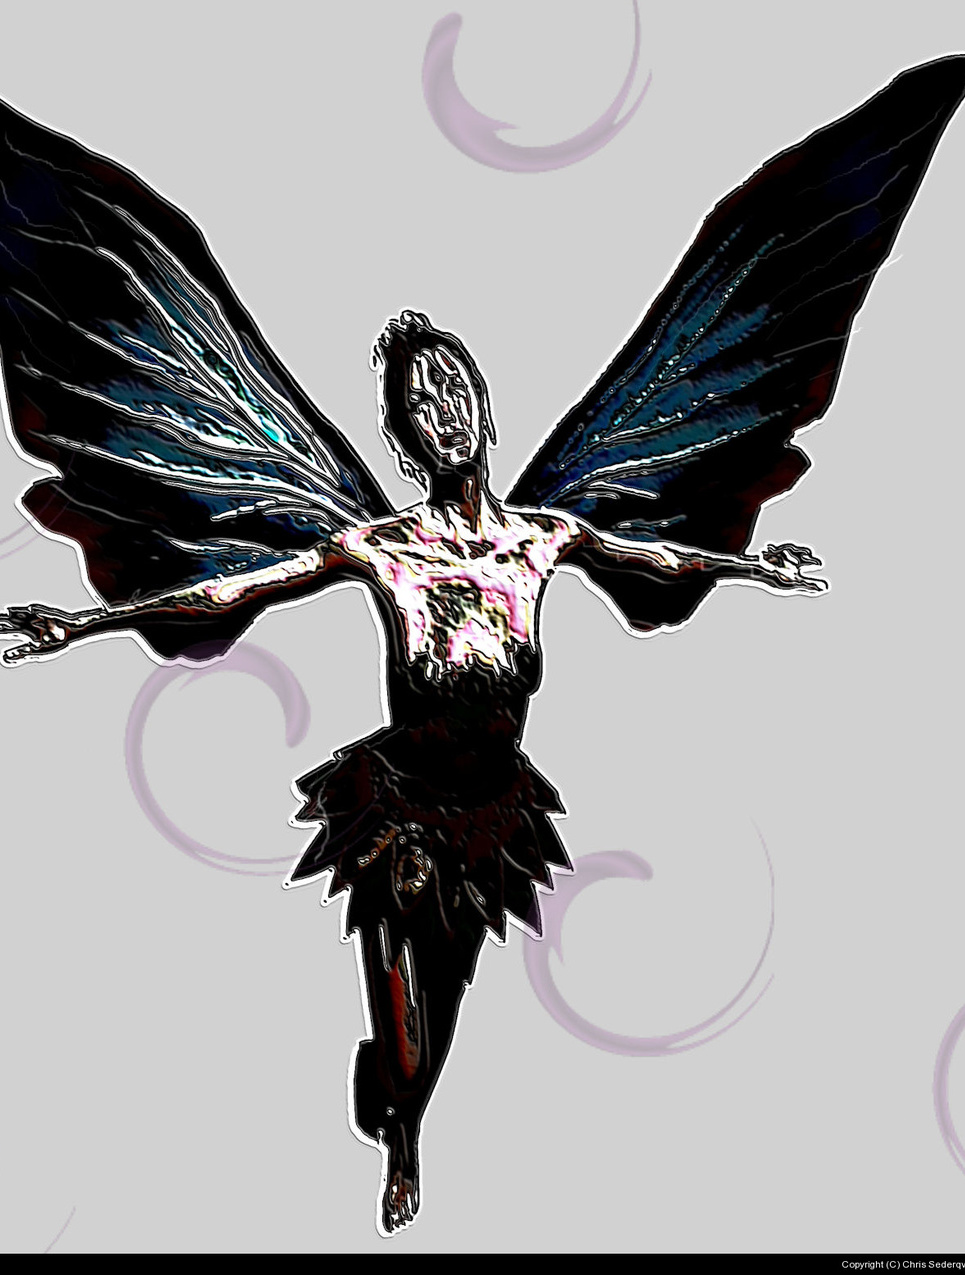 My fairy lady show